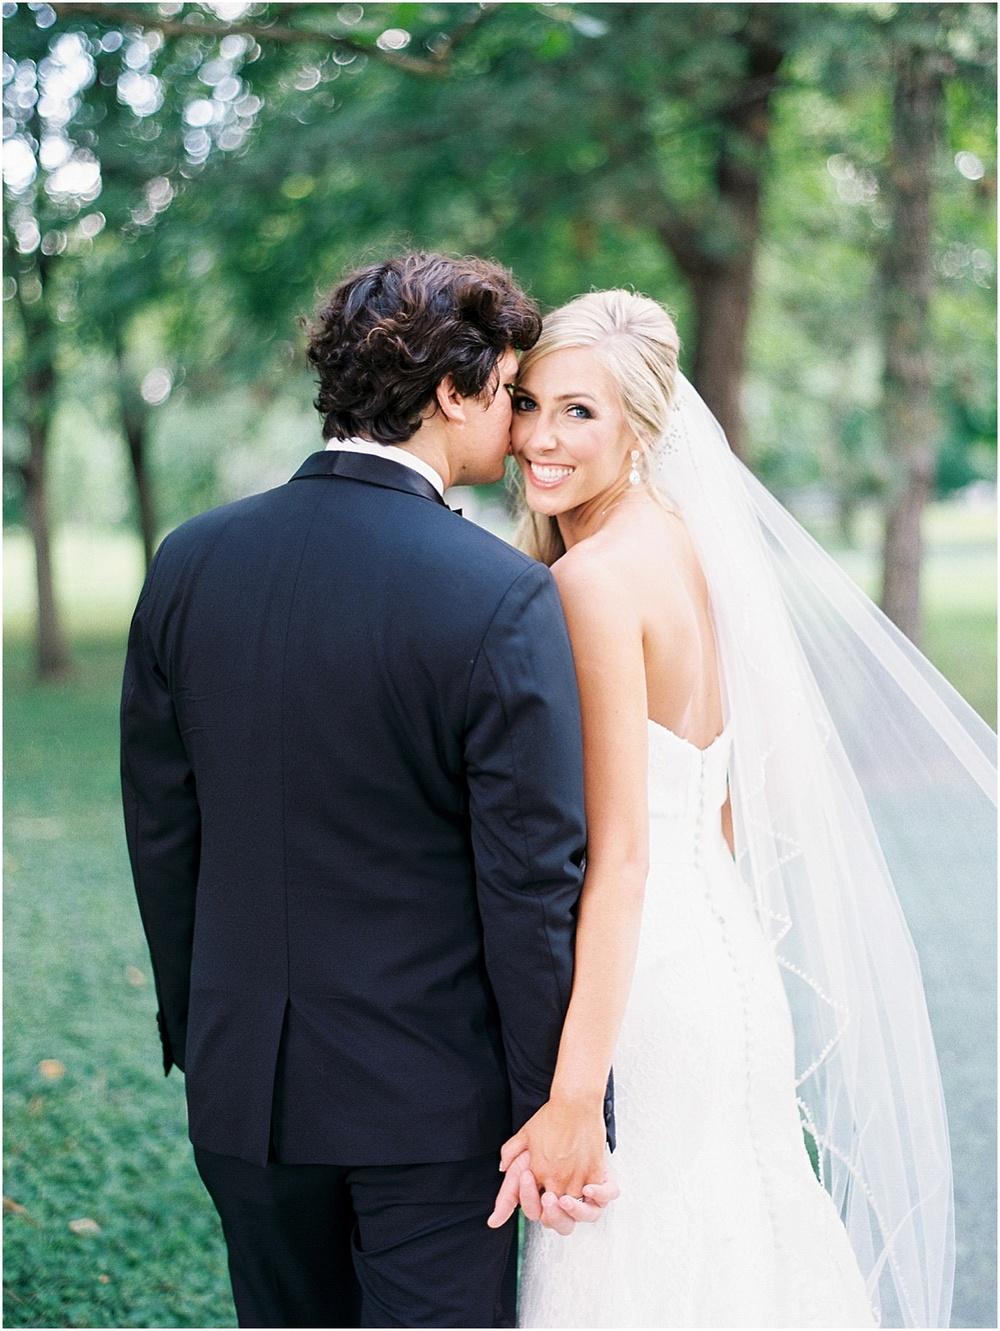 St_Louis_Wedding_Fine_Art_Film_Photographer_Jordan_Brittley_(www.jordanbrittley.com)_0040.jpg